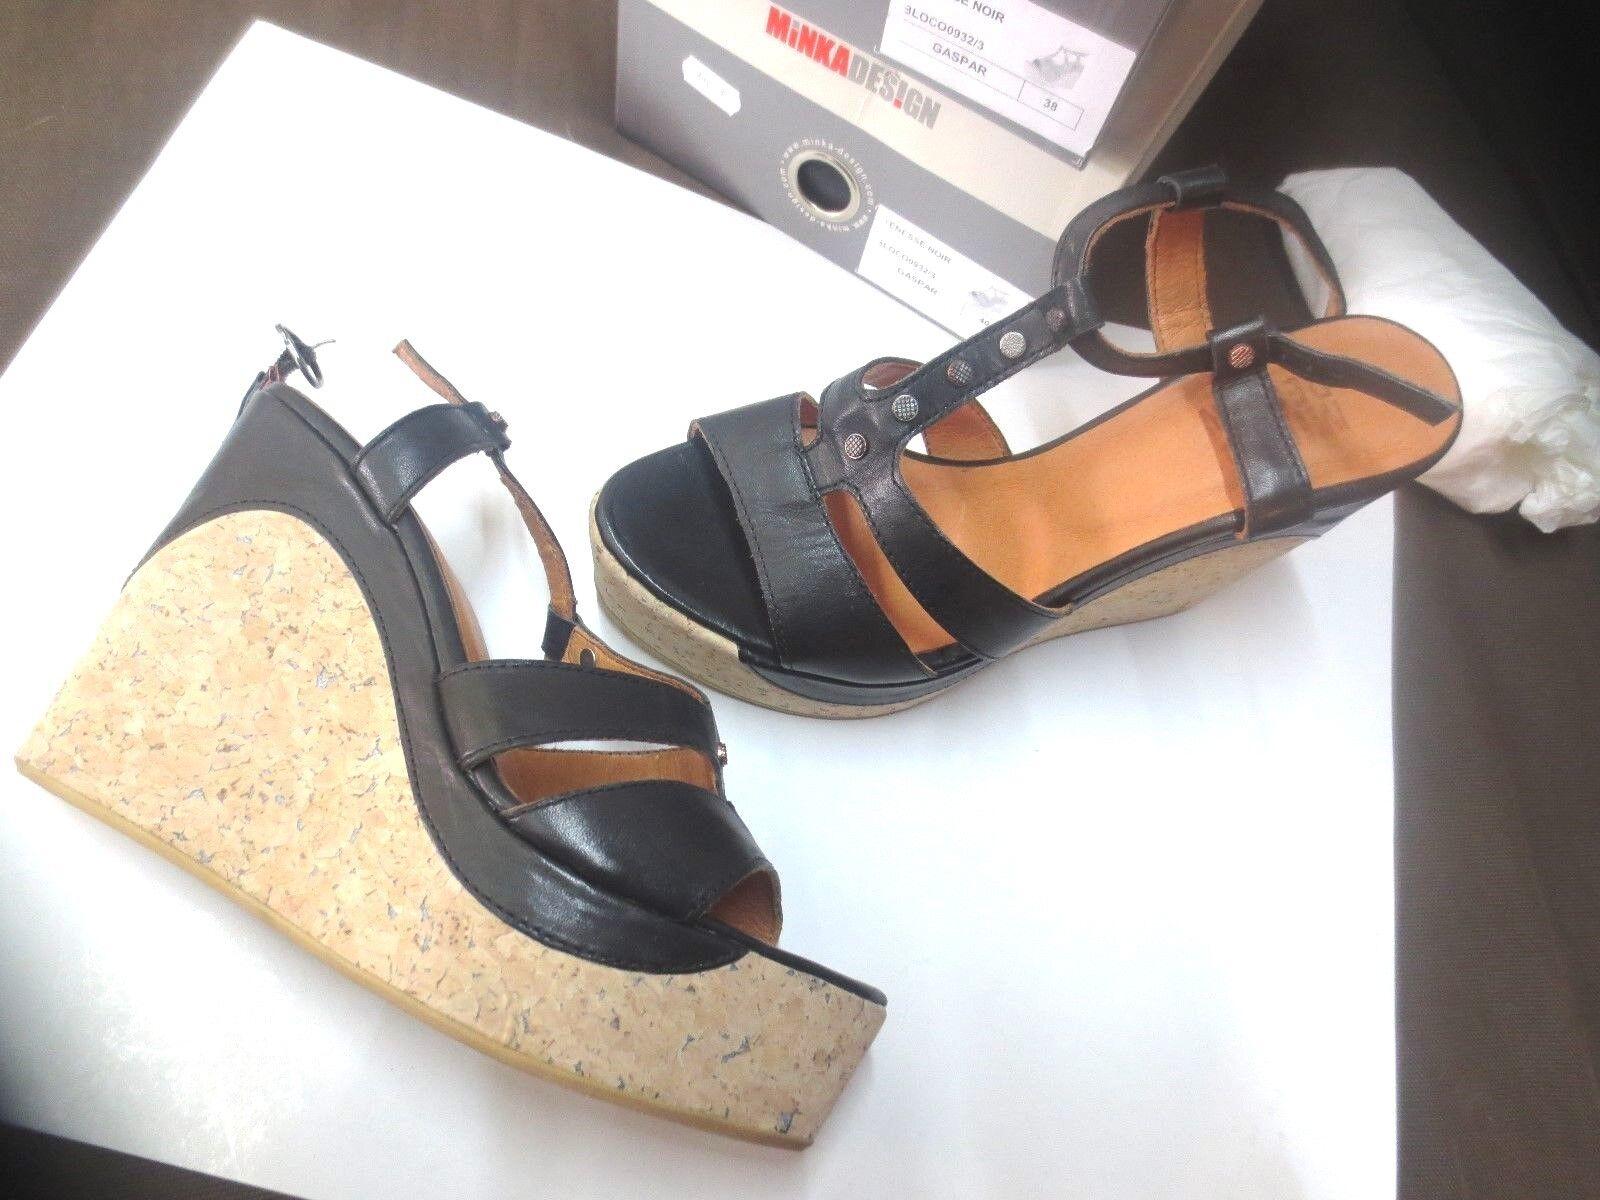 Minka schwarzes Sandale Keil Wert 139E schwarzes Minka Leder neu Schuhgrößen 38,40 5c5dd7